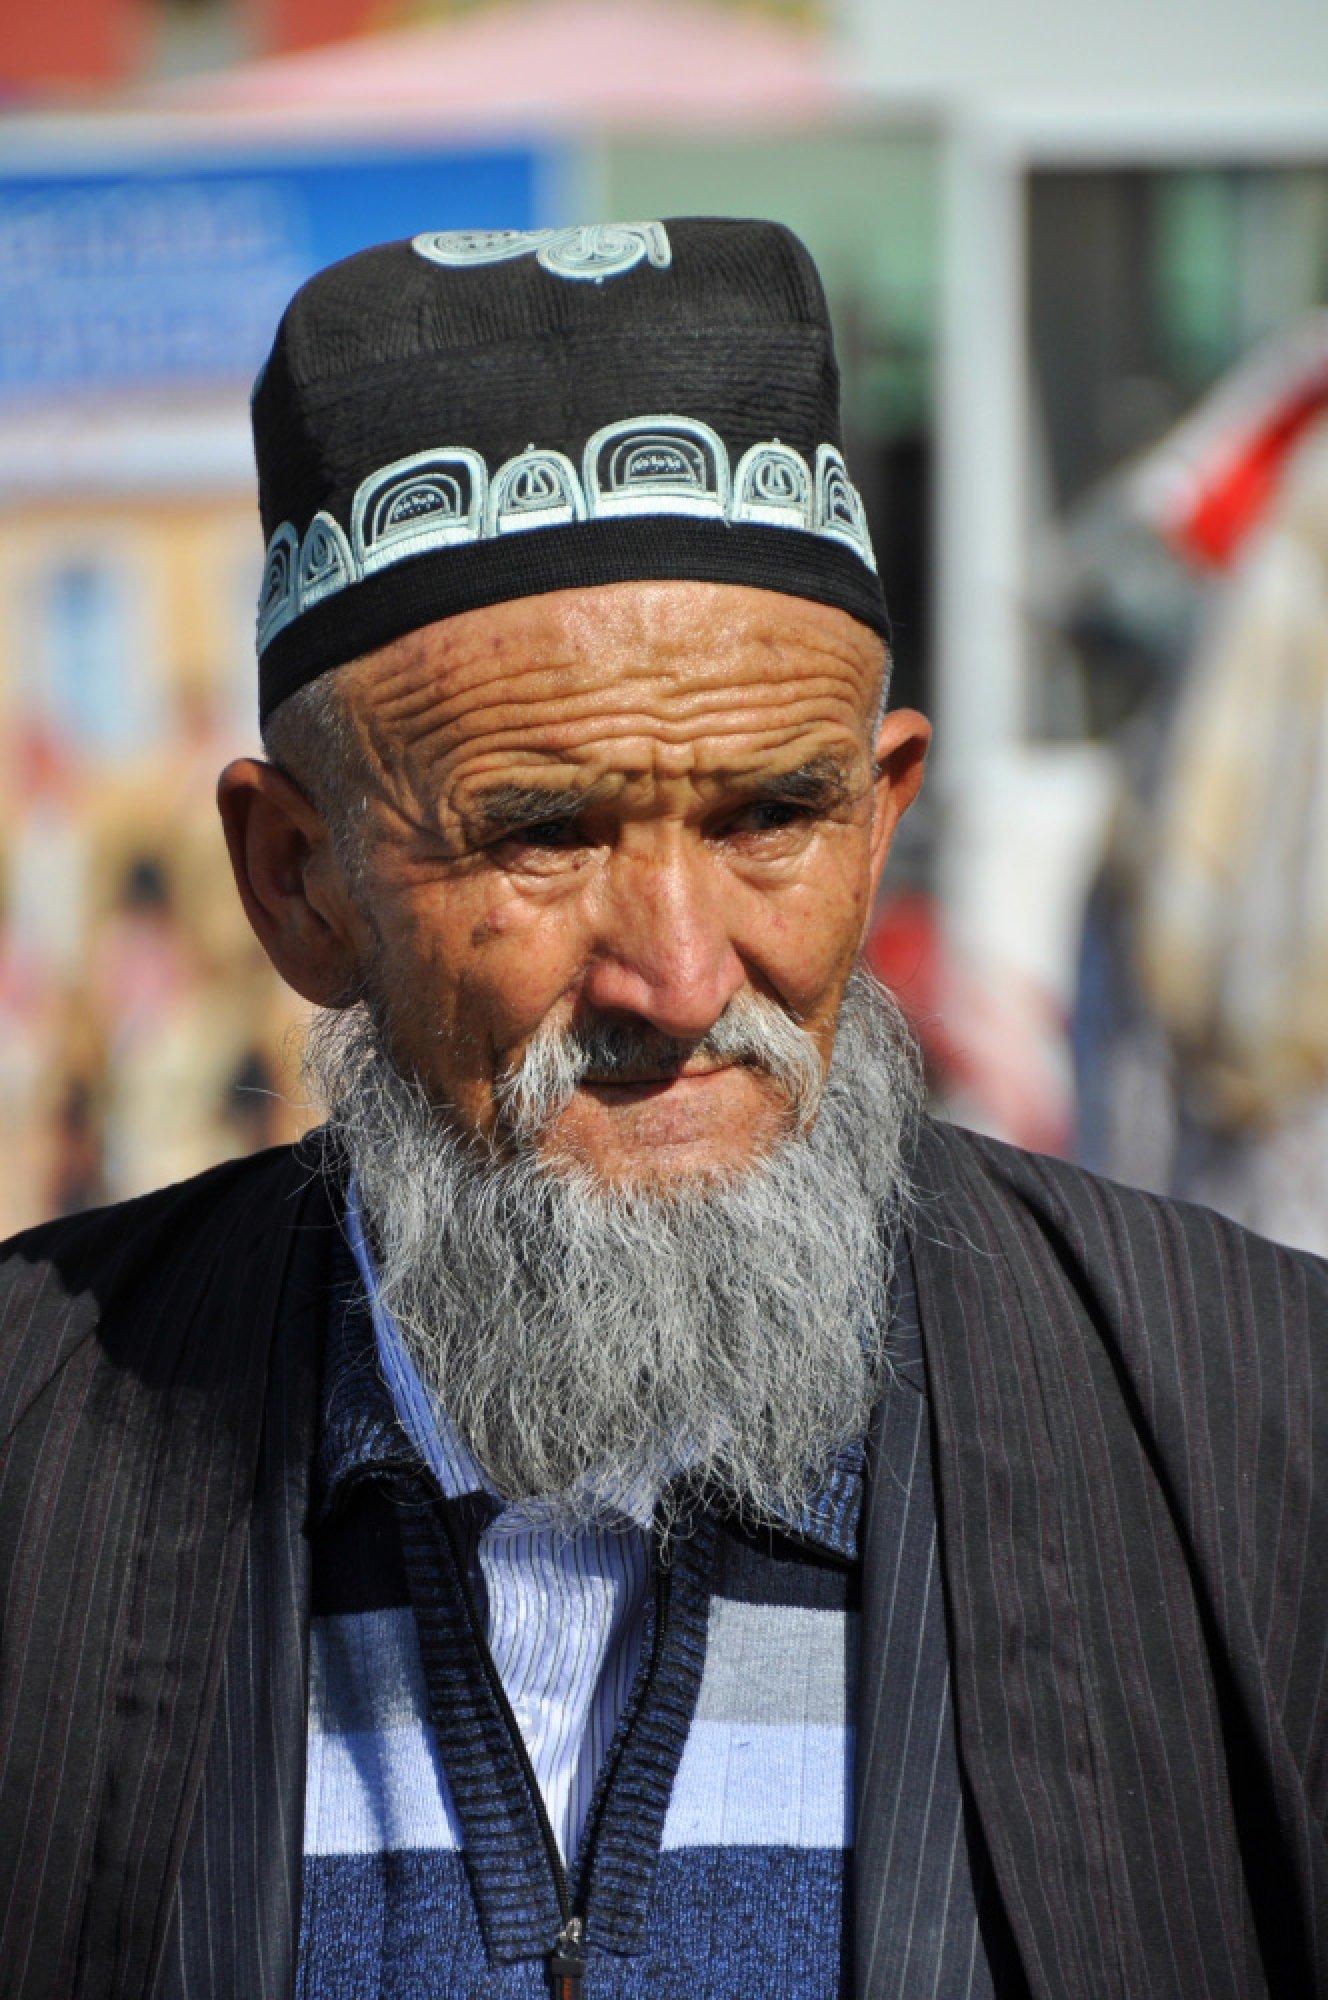 https://bubo.sk/uploads/galleries/3470/tadzikistan-02.jpg